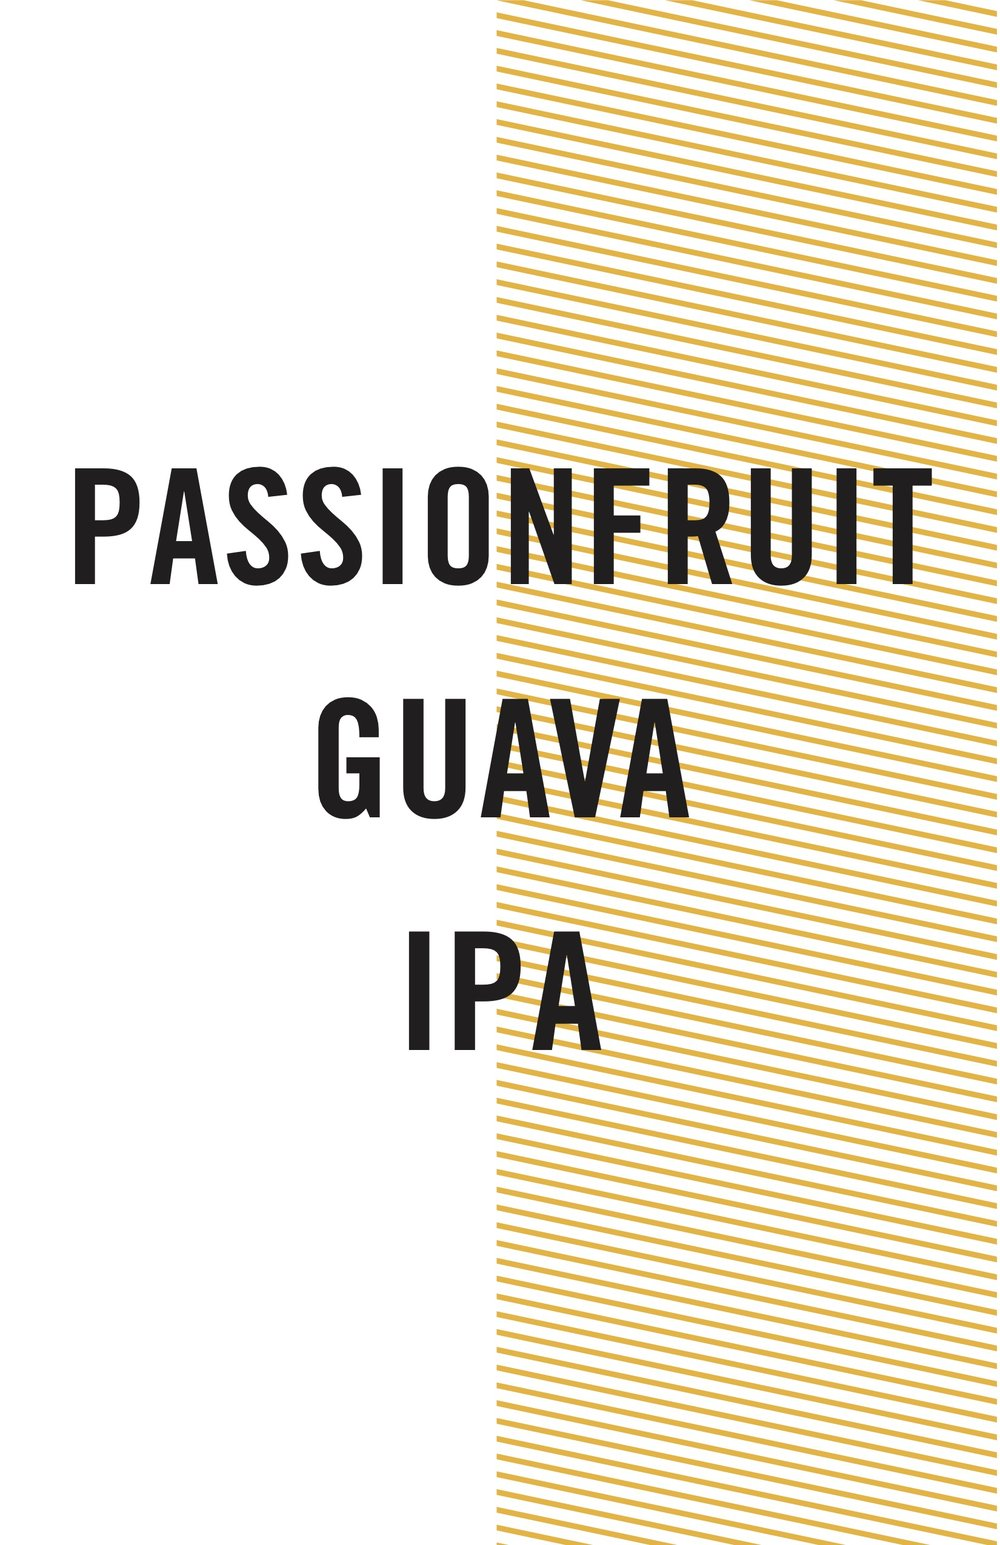 PASSIONFRUIT GUAVA IPA.jpg